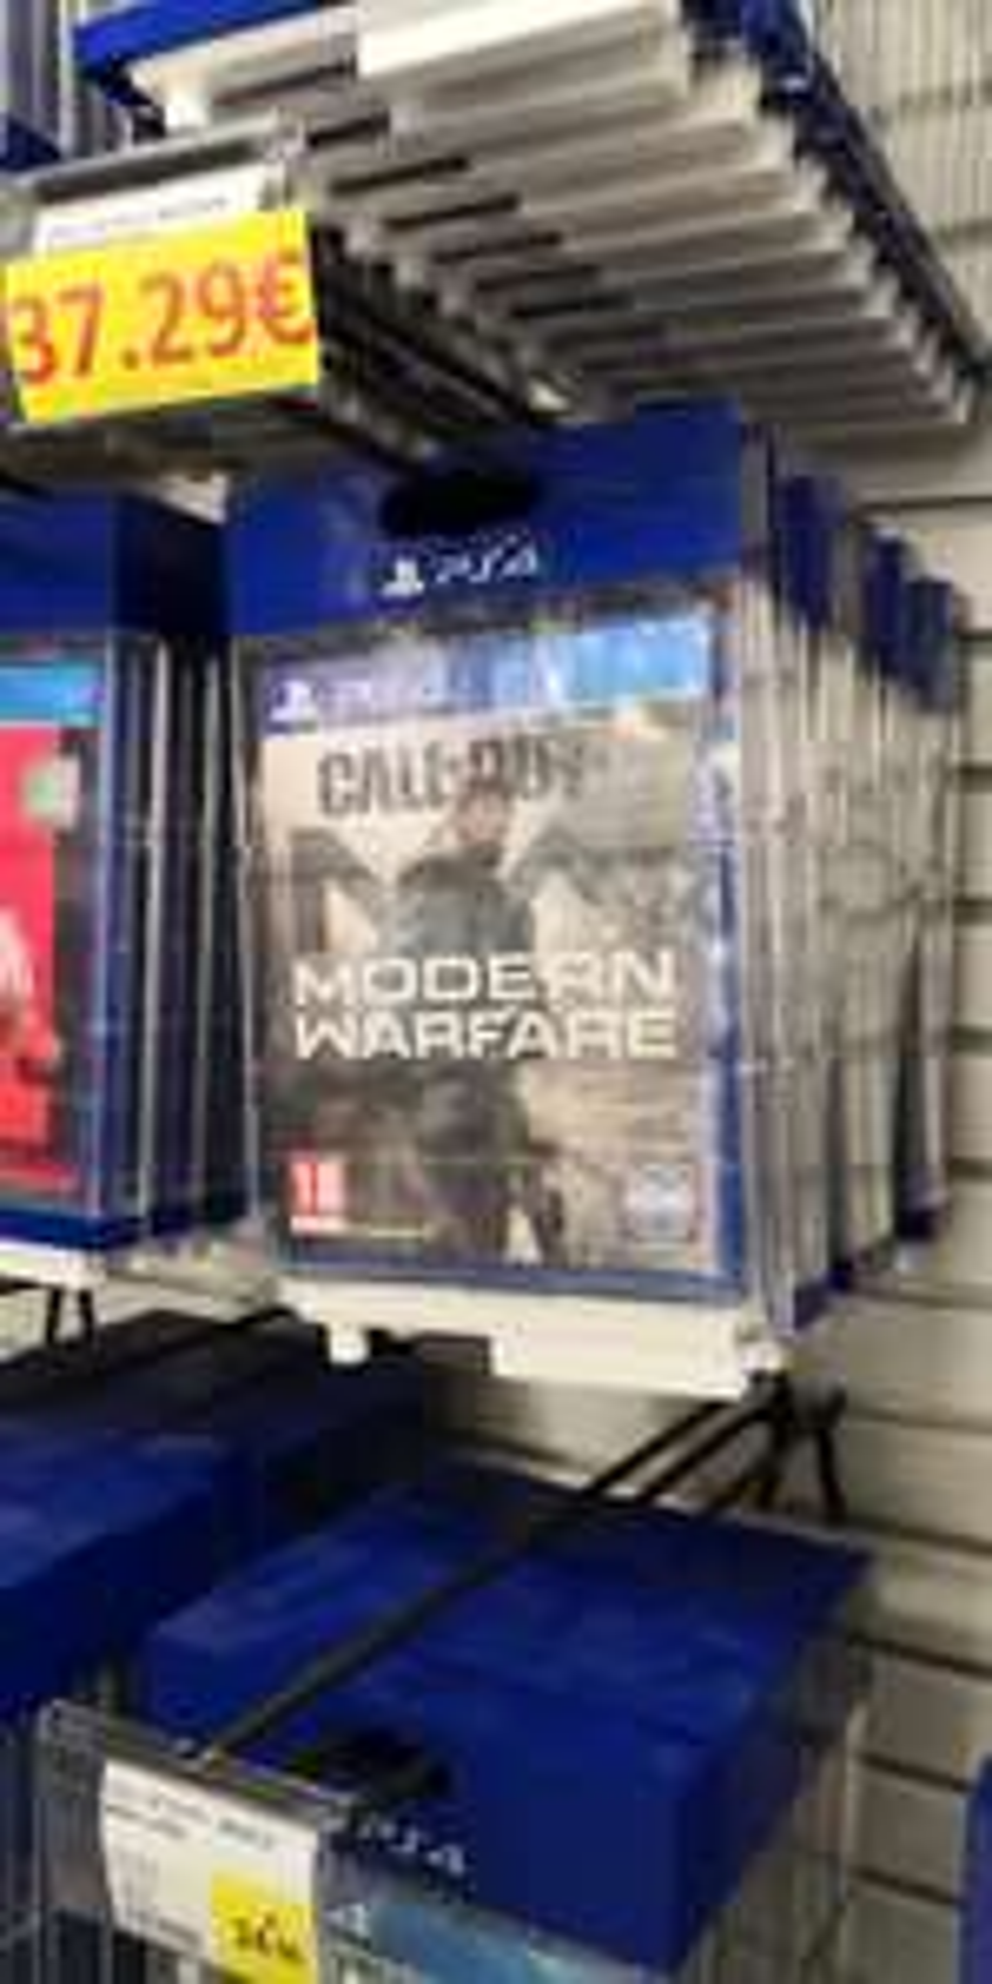 Call of Duty Modern Warfare sur PS4 - Firminy (42)